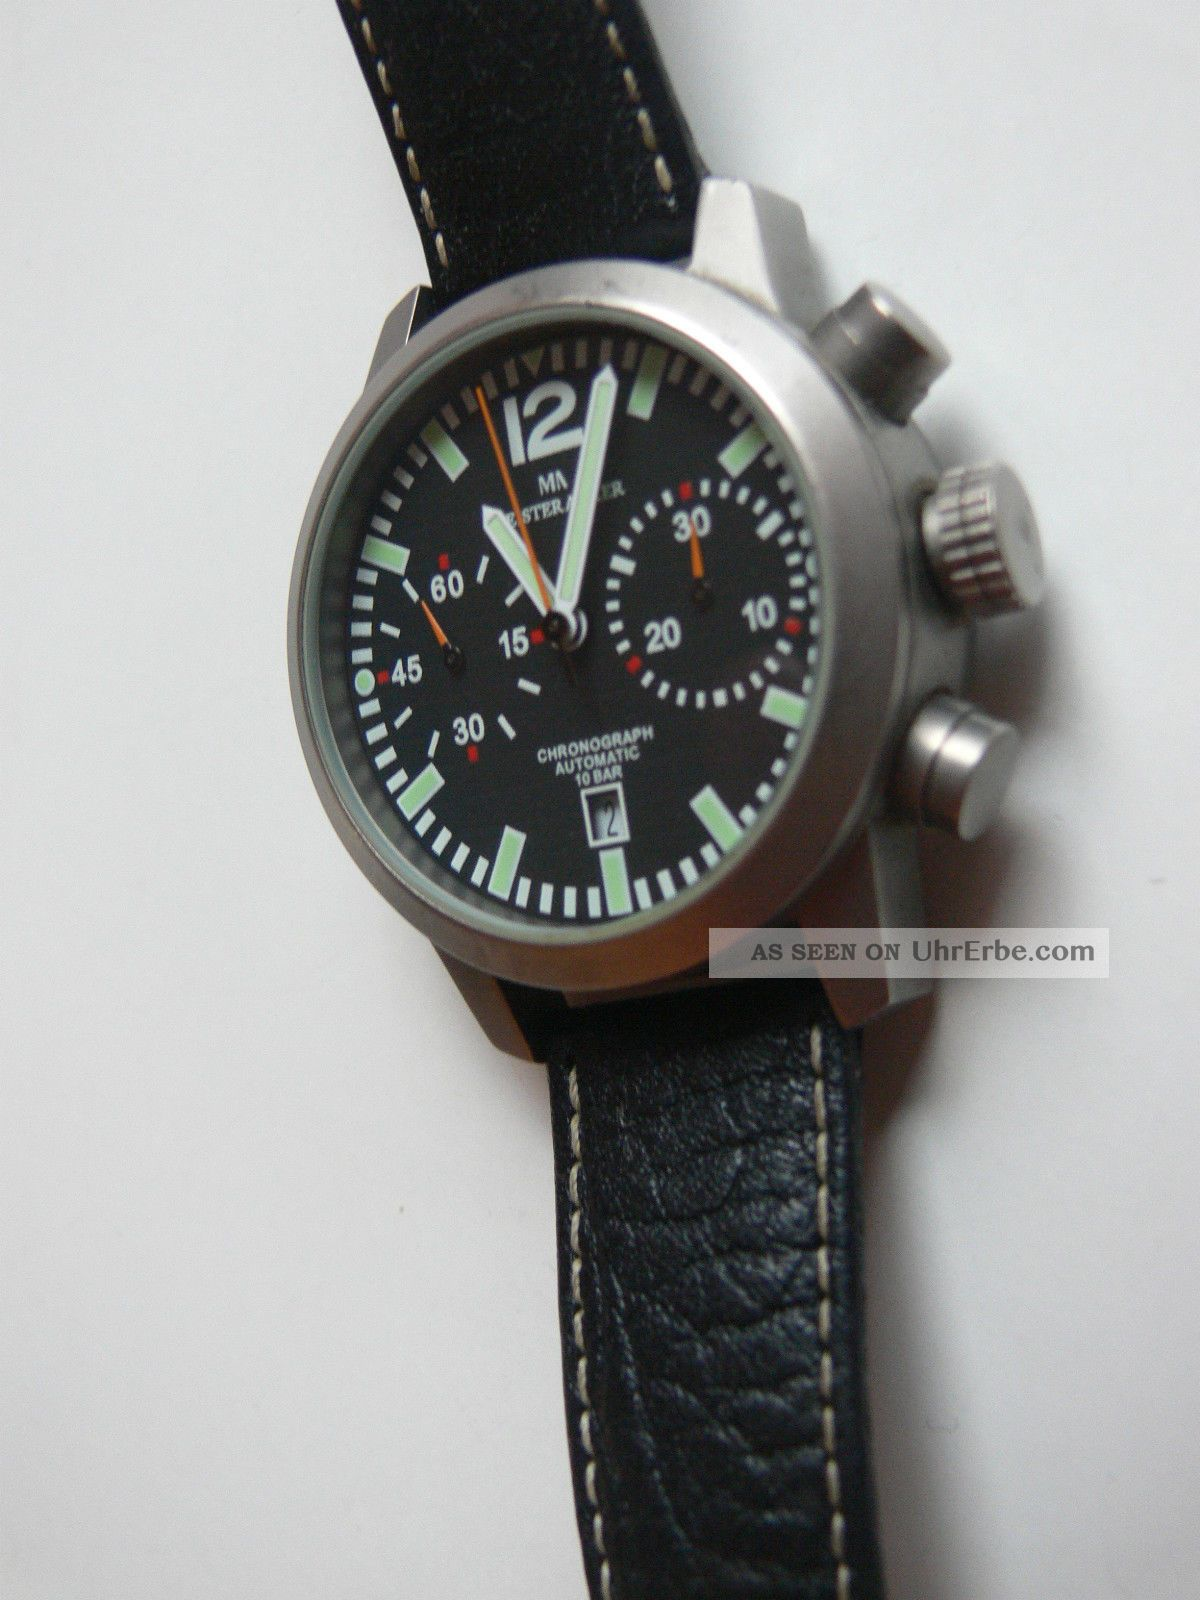 Chronograph Automatic 10 Bar Meister Anker 229.  248 0/234 Titanium Jewels Armbanduhren Bild